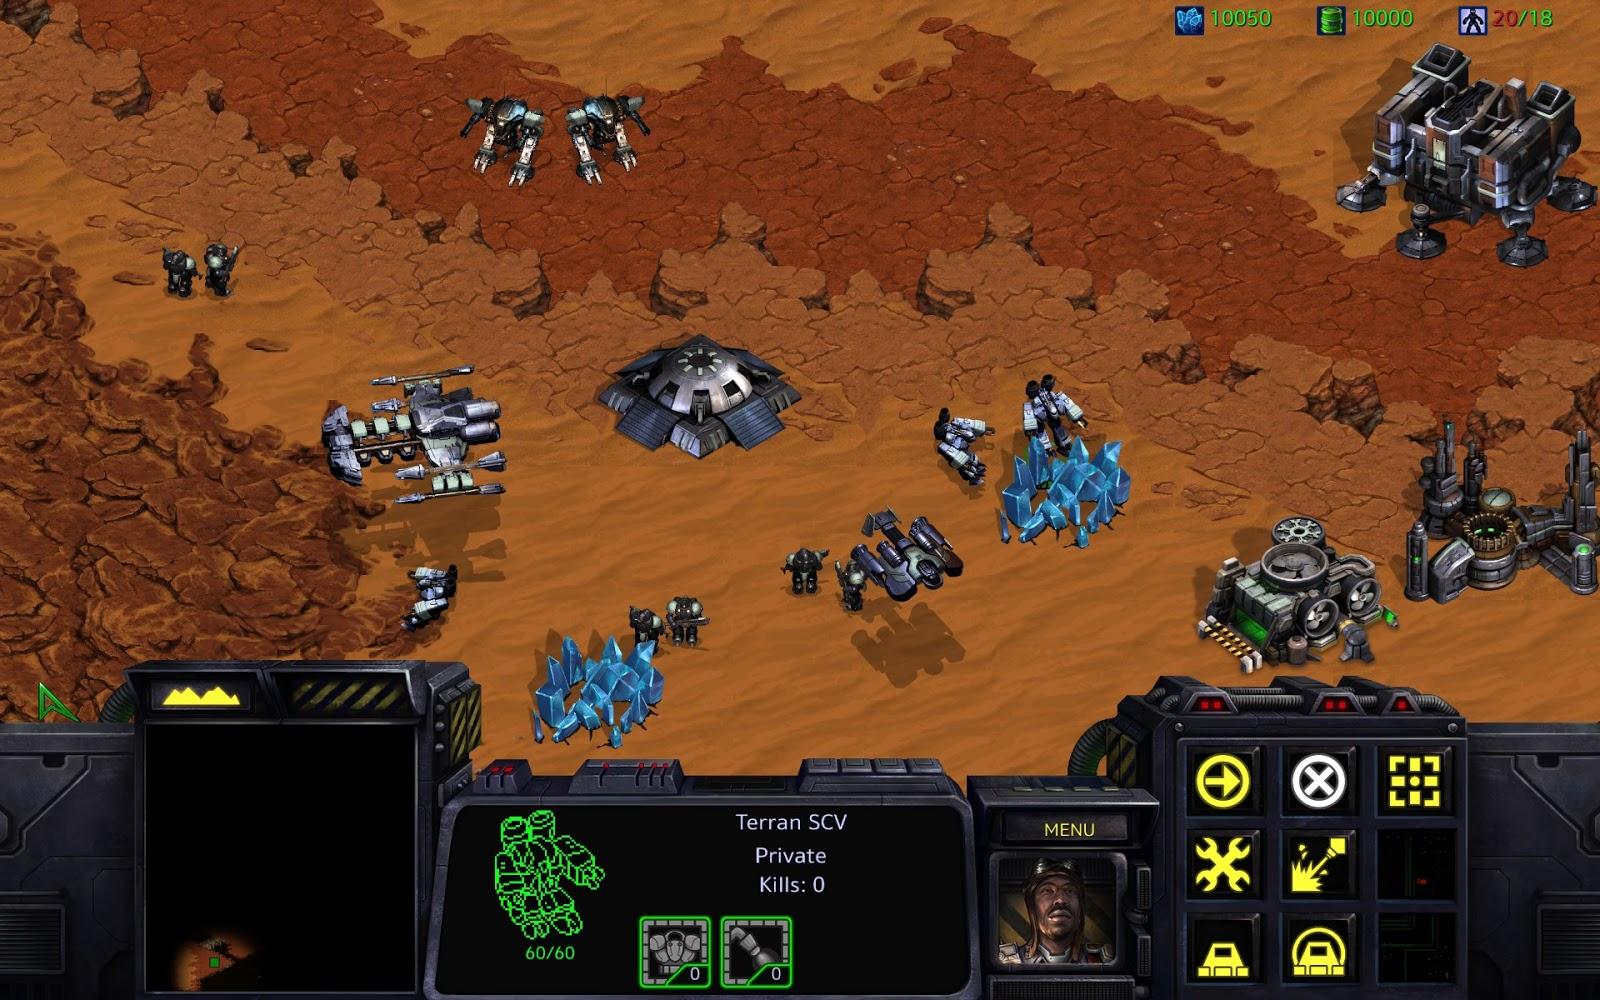 starcraft map hack brood war - FREE ONLINE